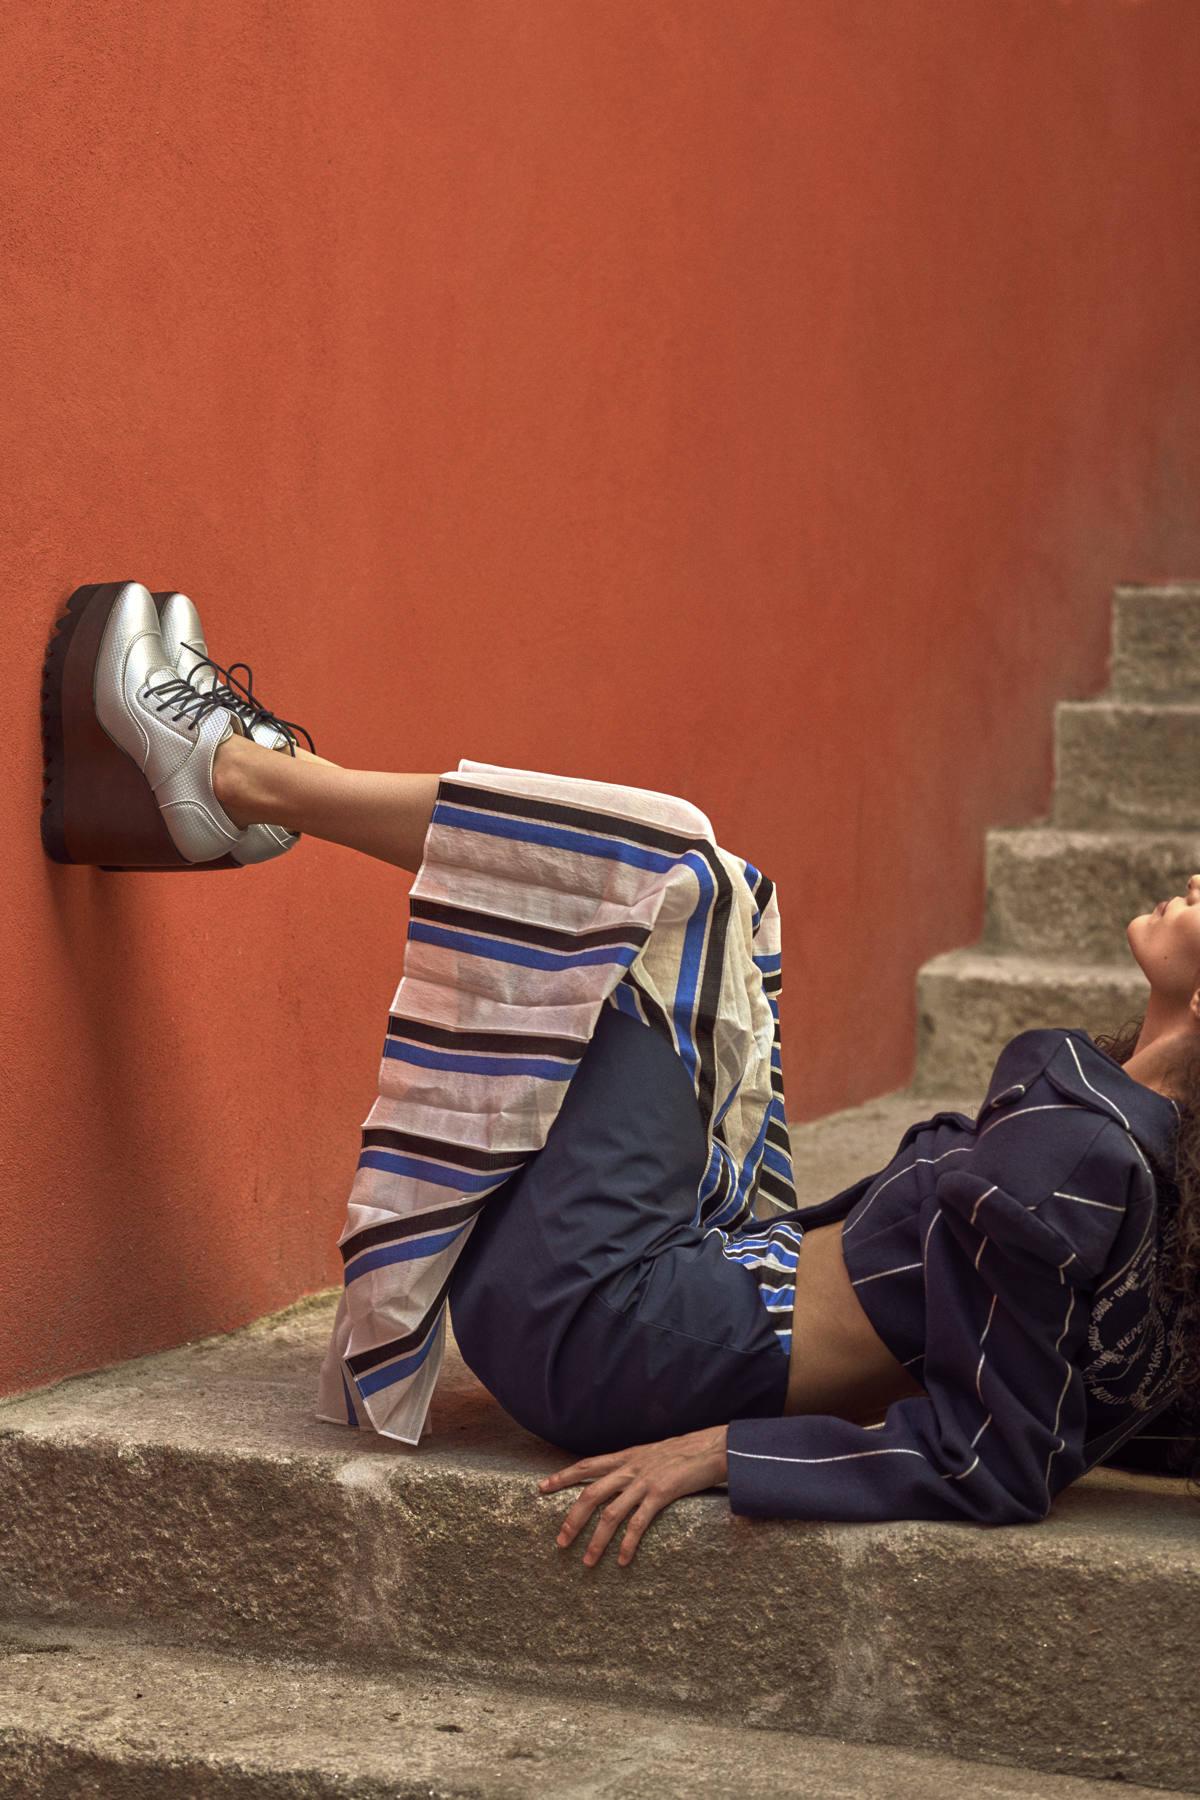 ethical fashion, sustainable fashion, slow fashion, fair fashion, luxiders magazine, ethical fashion editorial, sustainable fashion editorial, ethical fashion inspiration, ethical fashion story, porto, porto fashion week, modtissimo, Marita Moreno, Avasan, Misci, Buki Akomolafe, Ivan Almeida, Coraçao Alecrim, NS Gaia